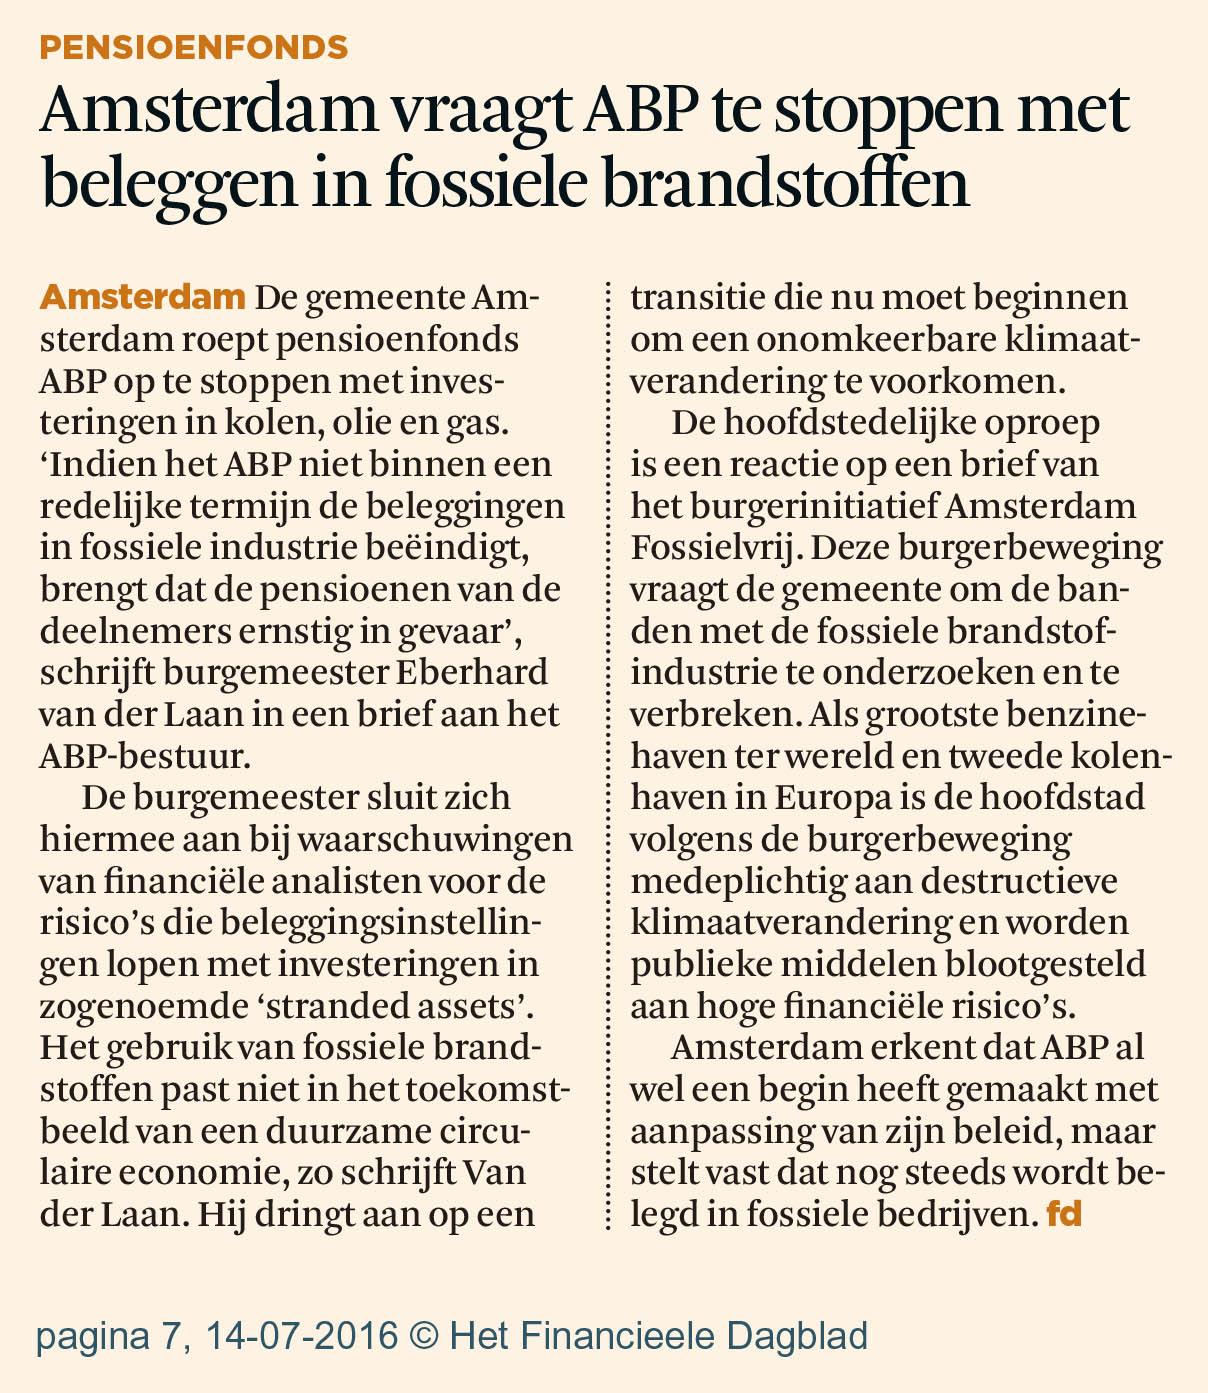 krant-20160714-0-007-002-Amsterdam-vraagt-ABP